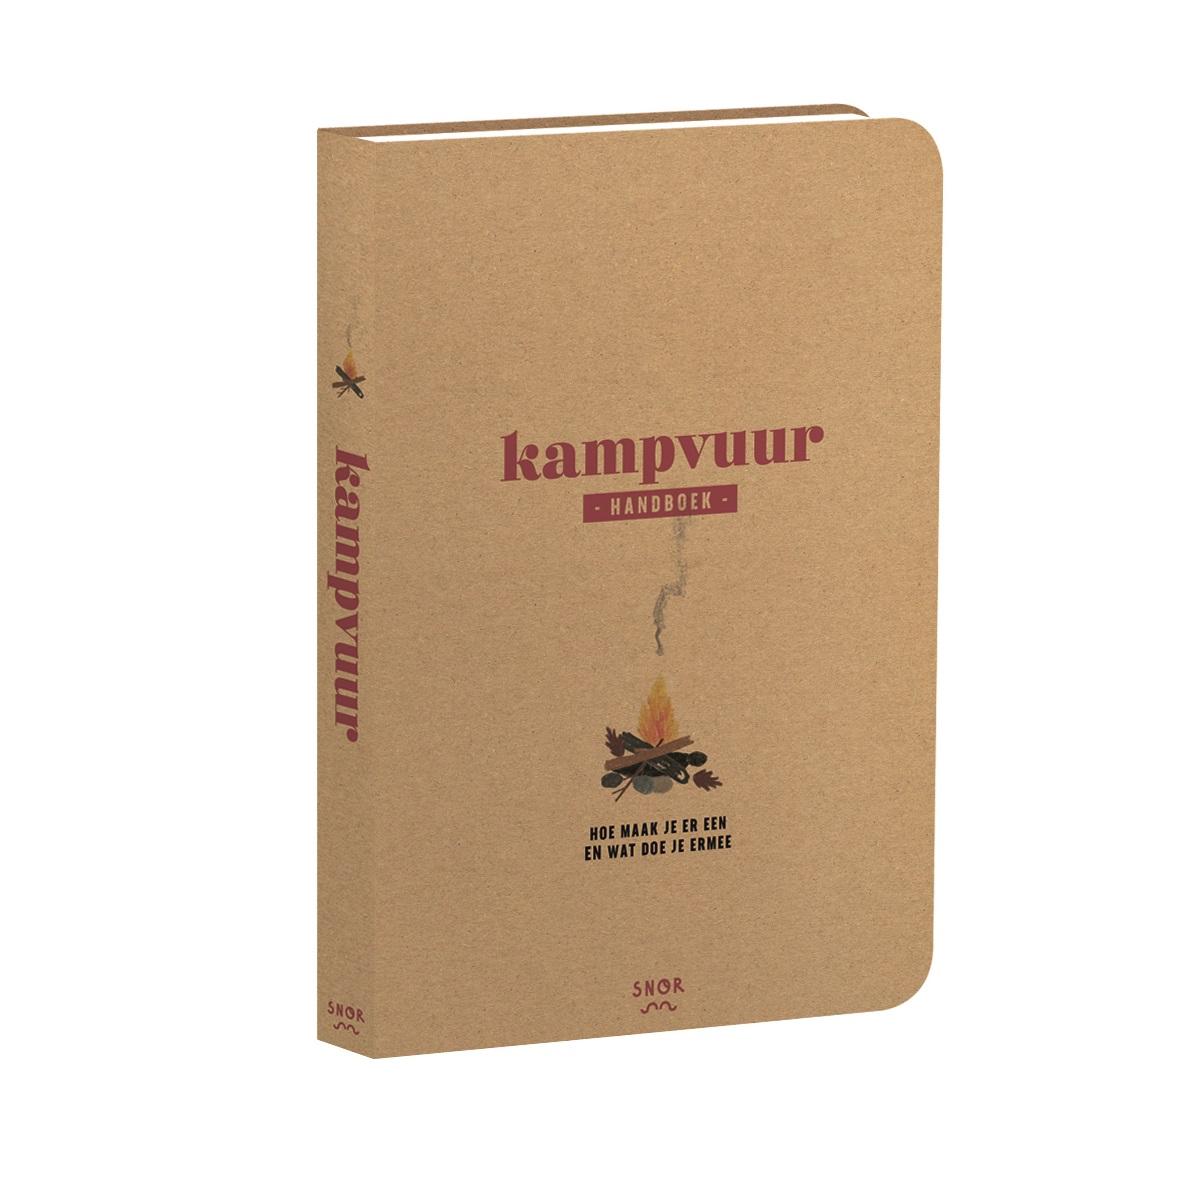 Snor Kampvuur Handboek